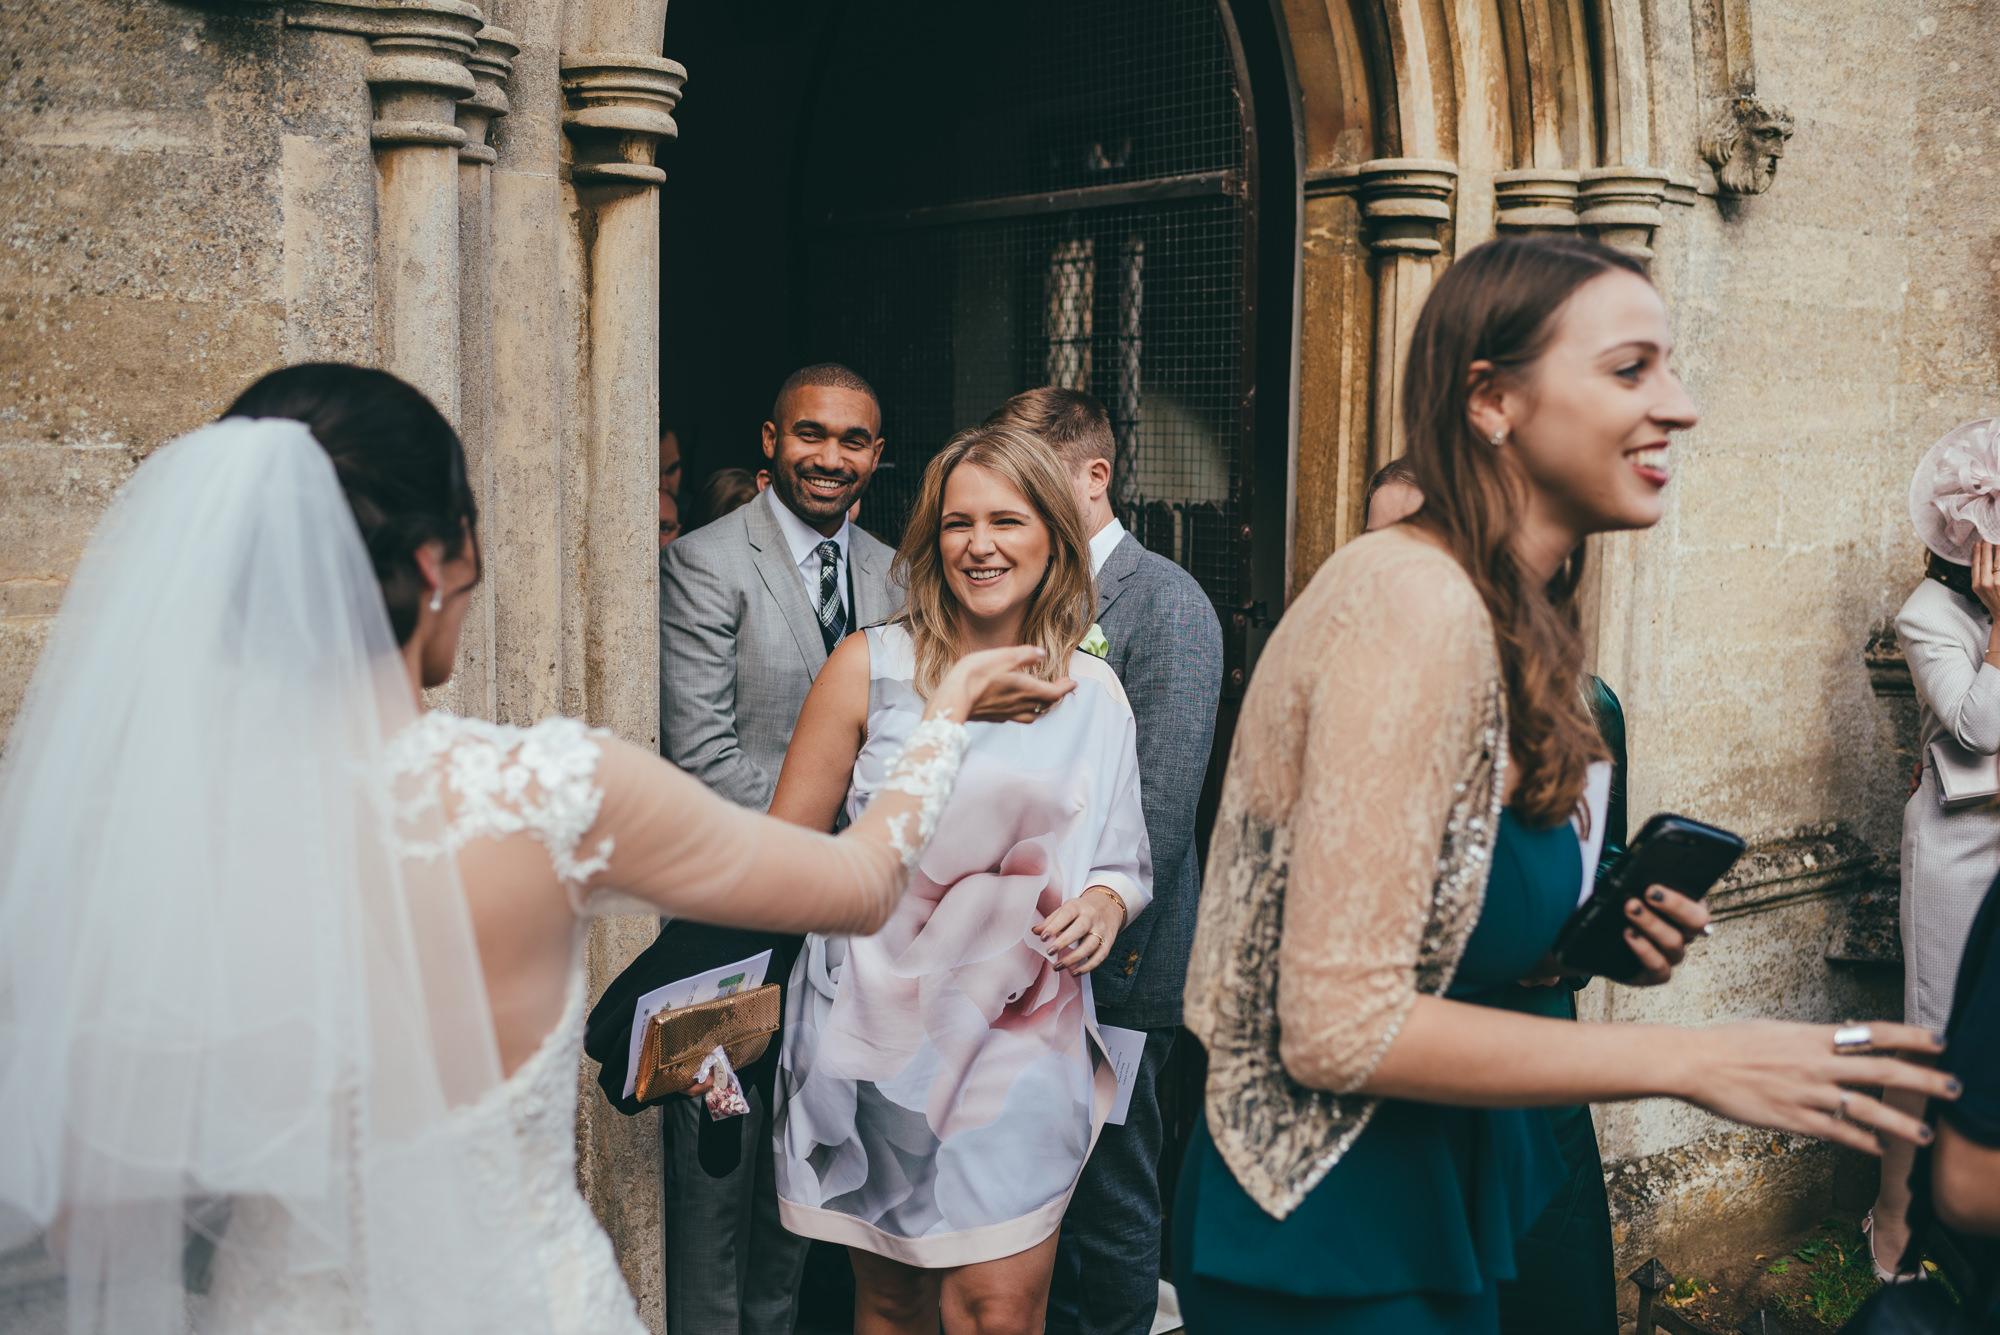 guests congratulate the bride